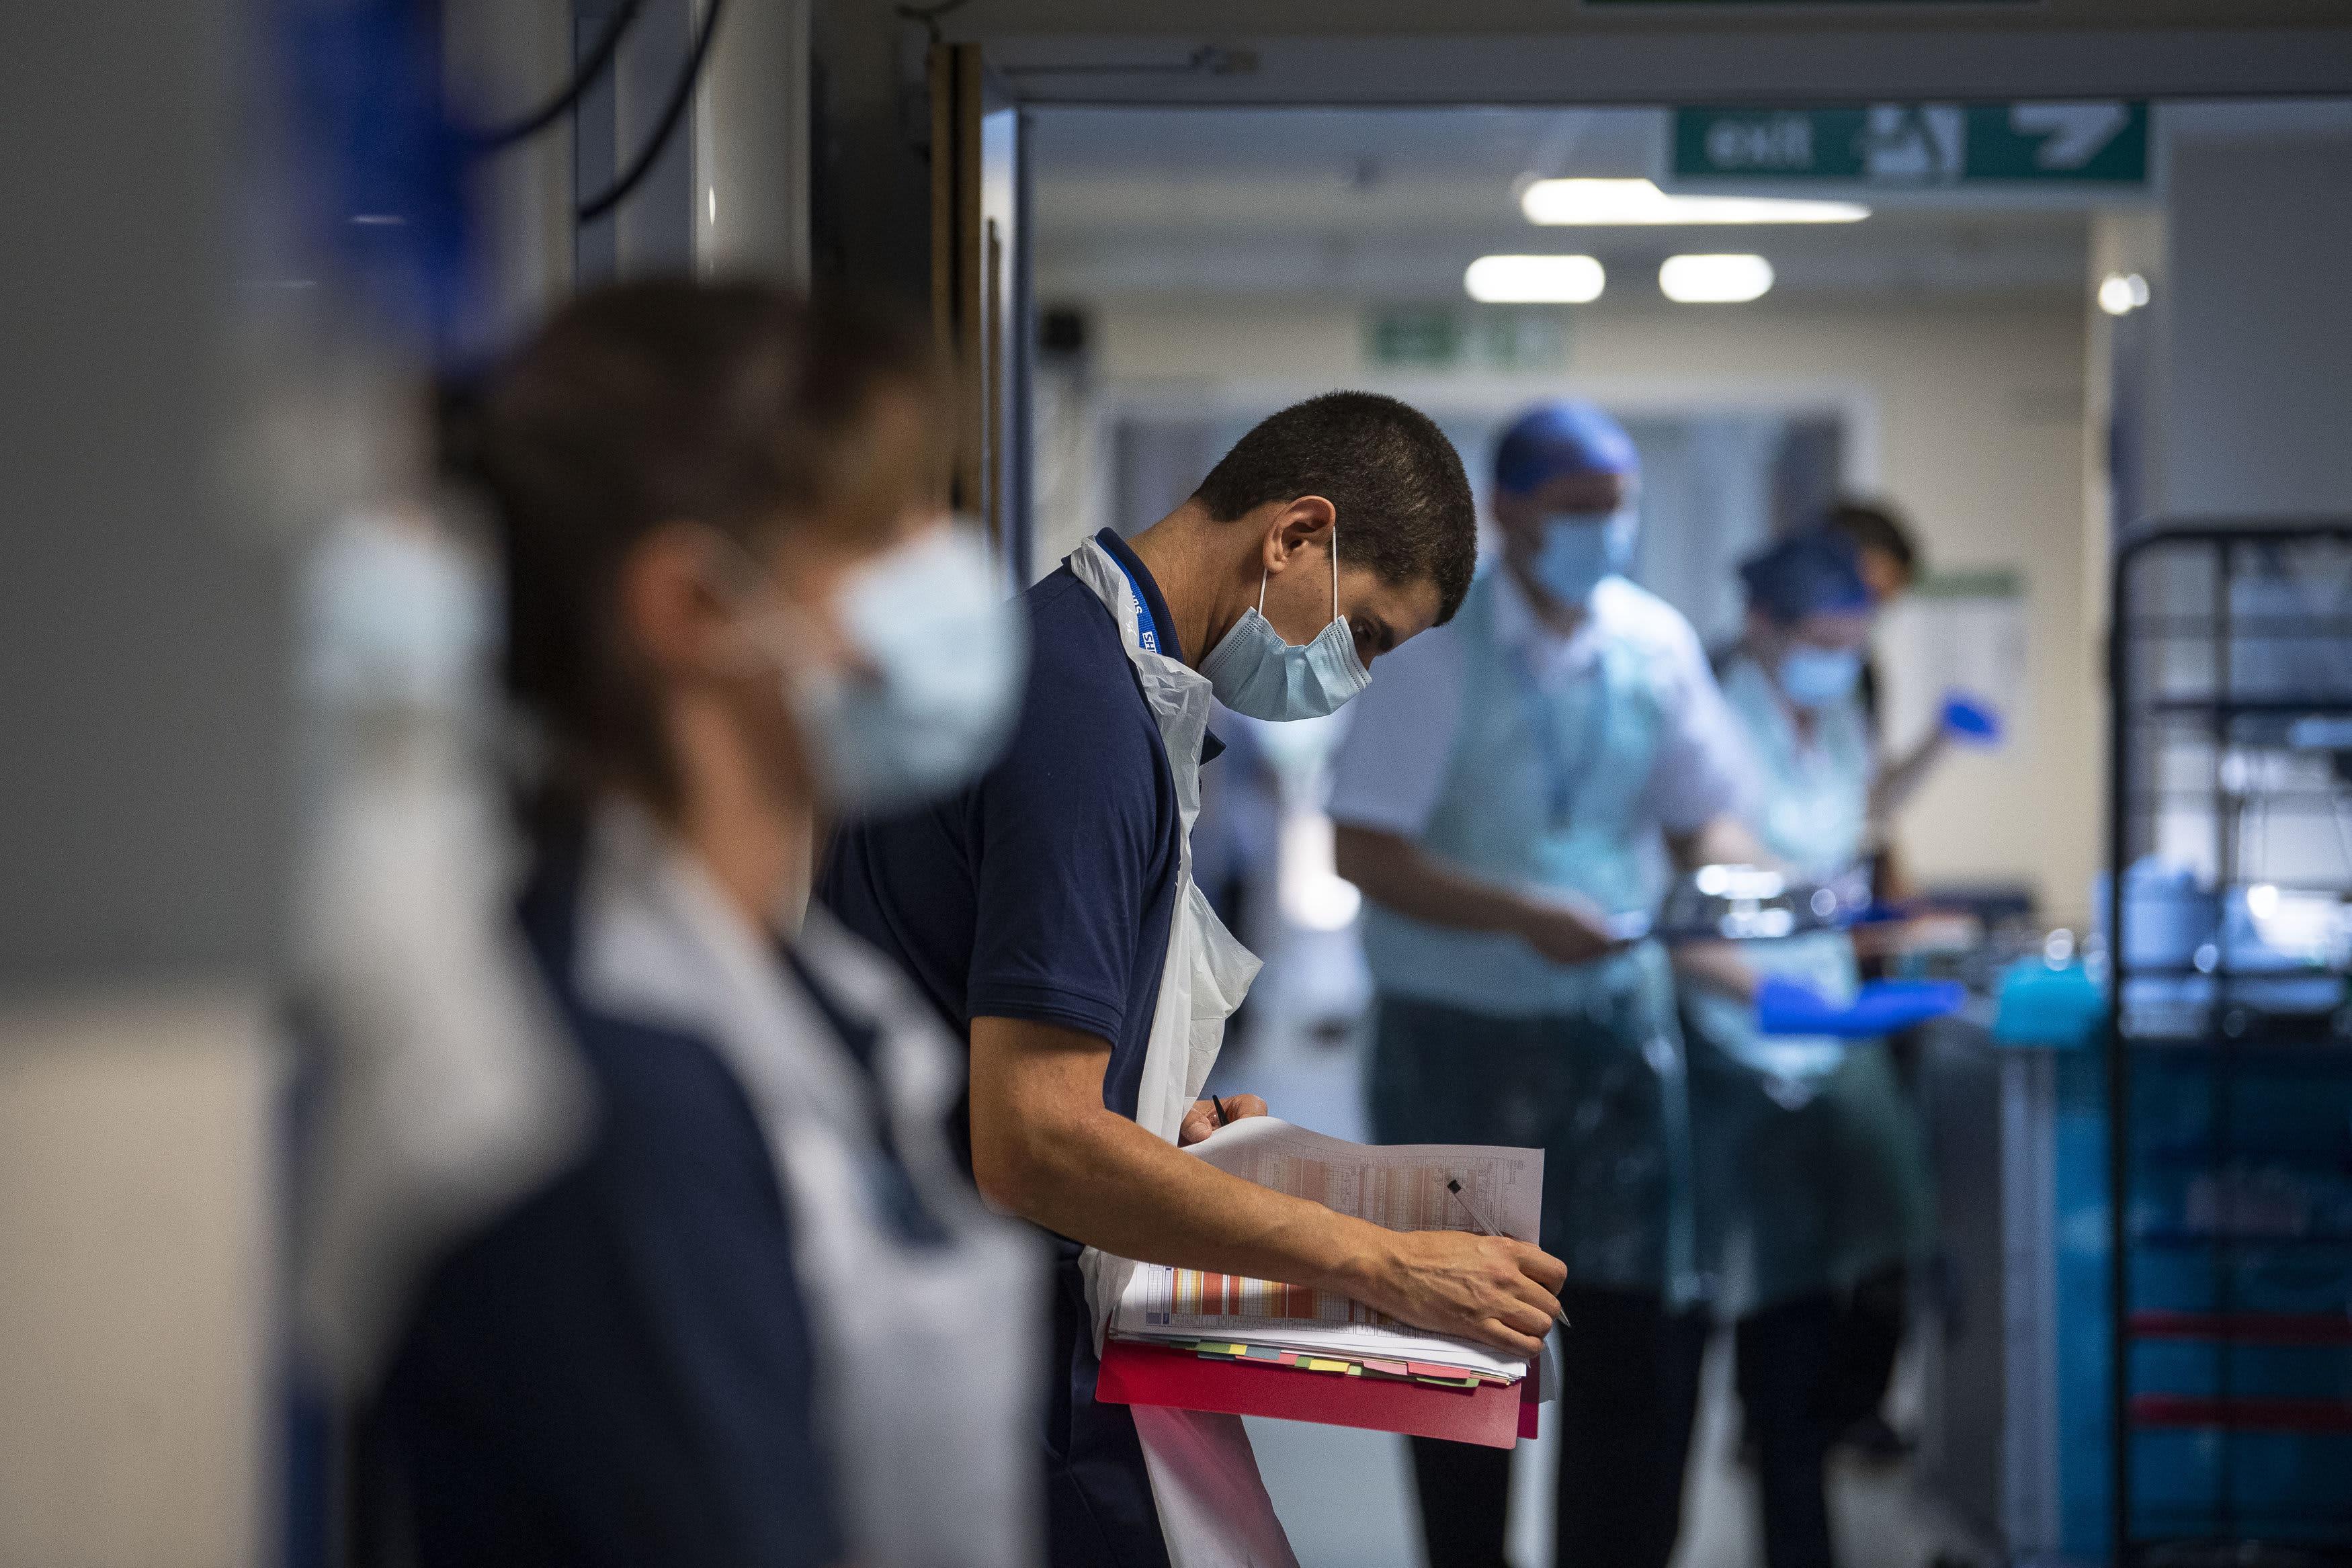 European markets close lower amid coronavirus spike; Travel and leisure stocks fall 3.4% - CNBC